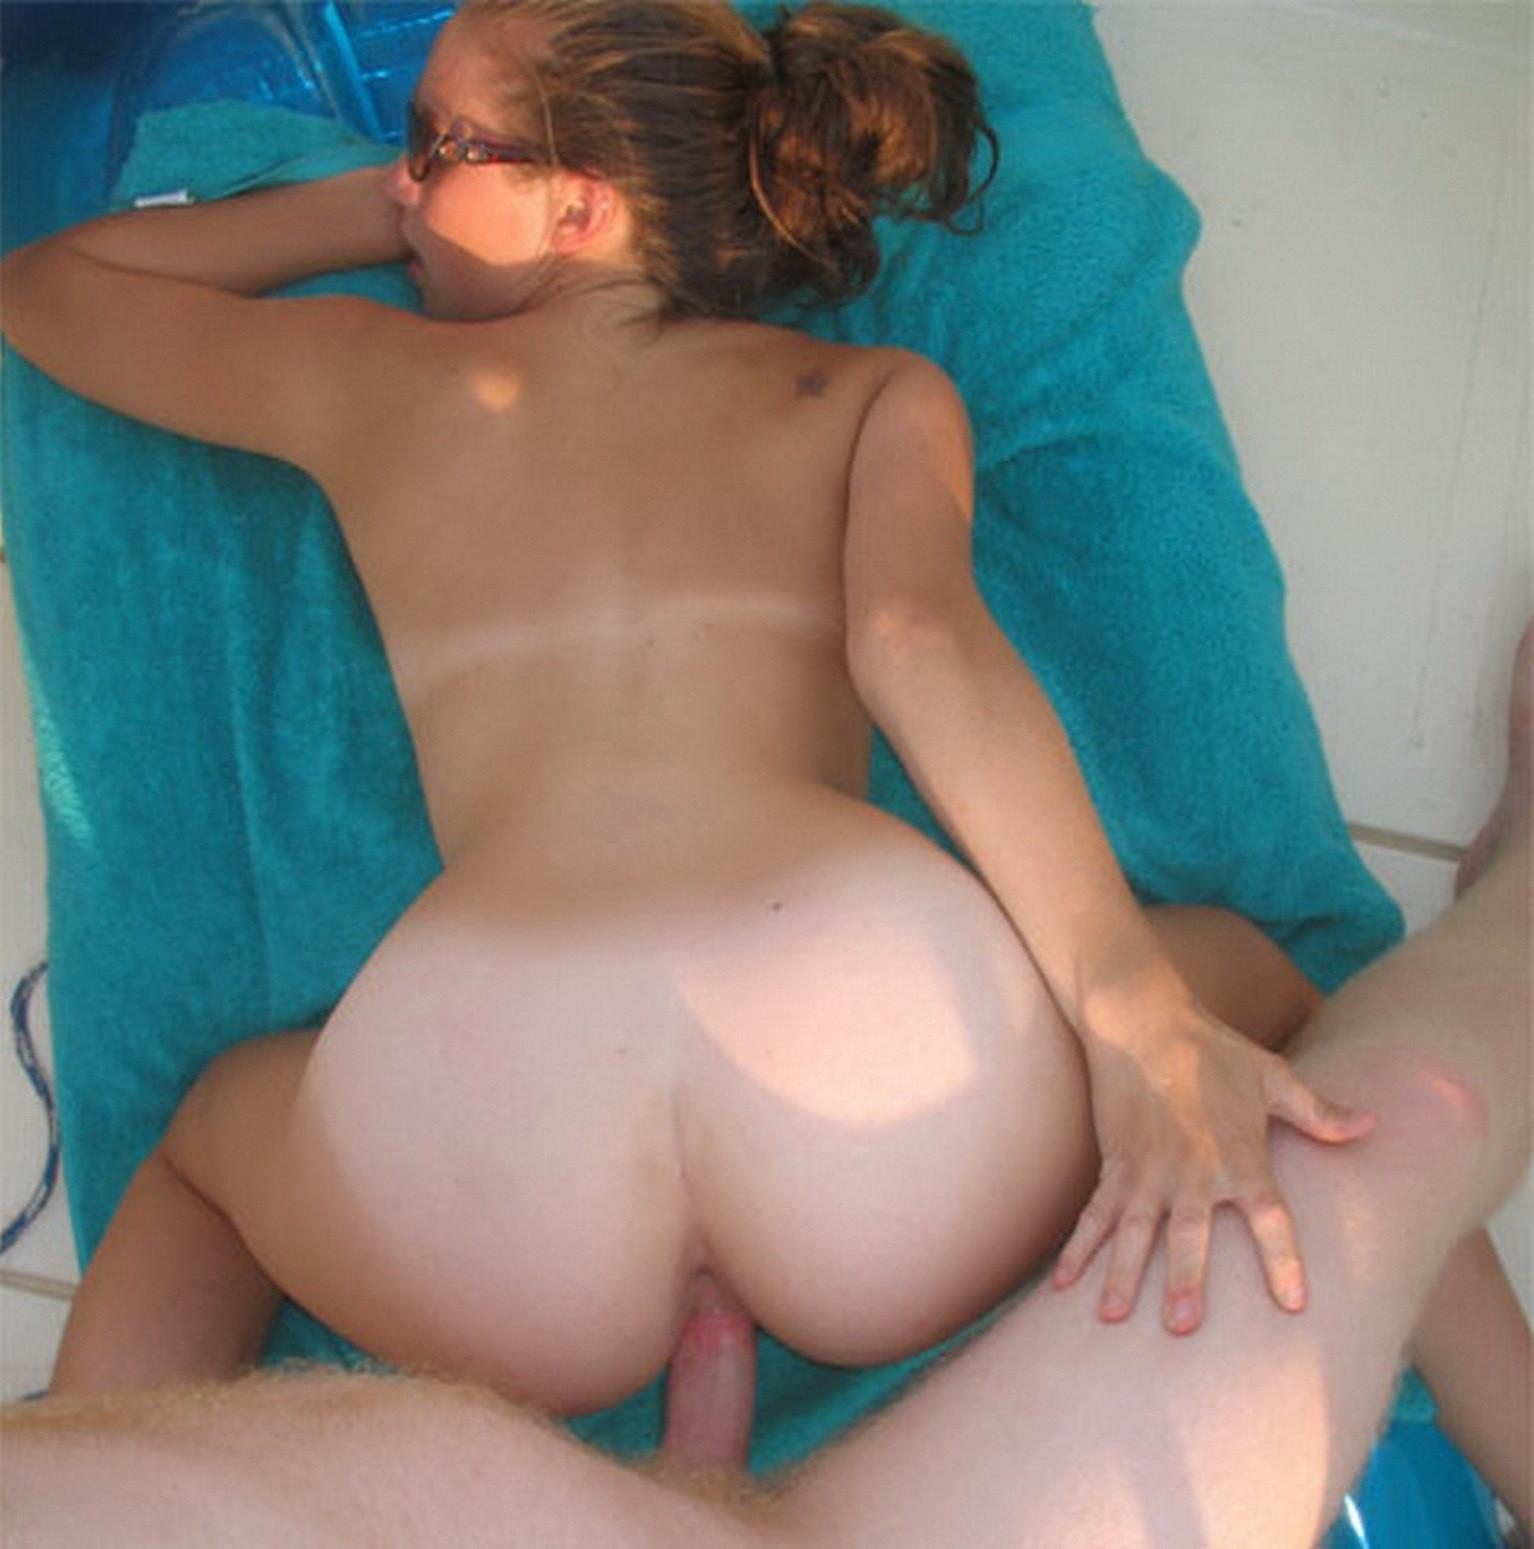 women news anchor nipple slip hot girls wallpaper